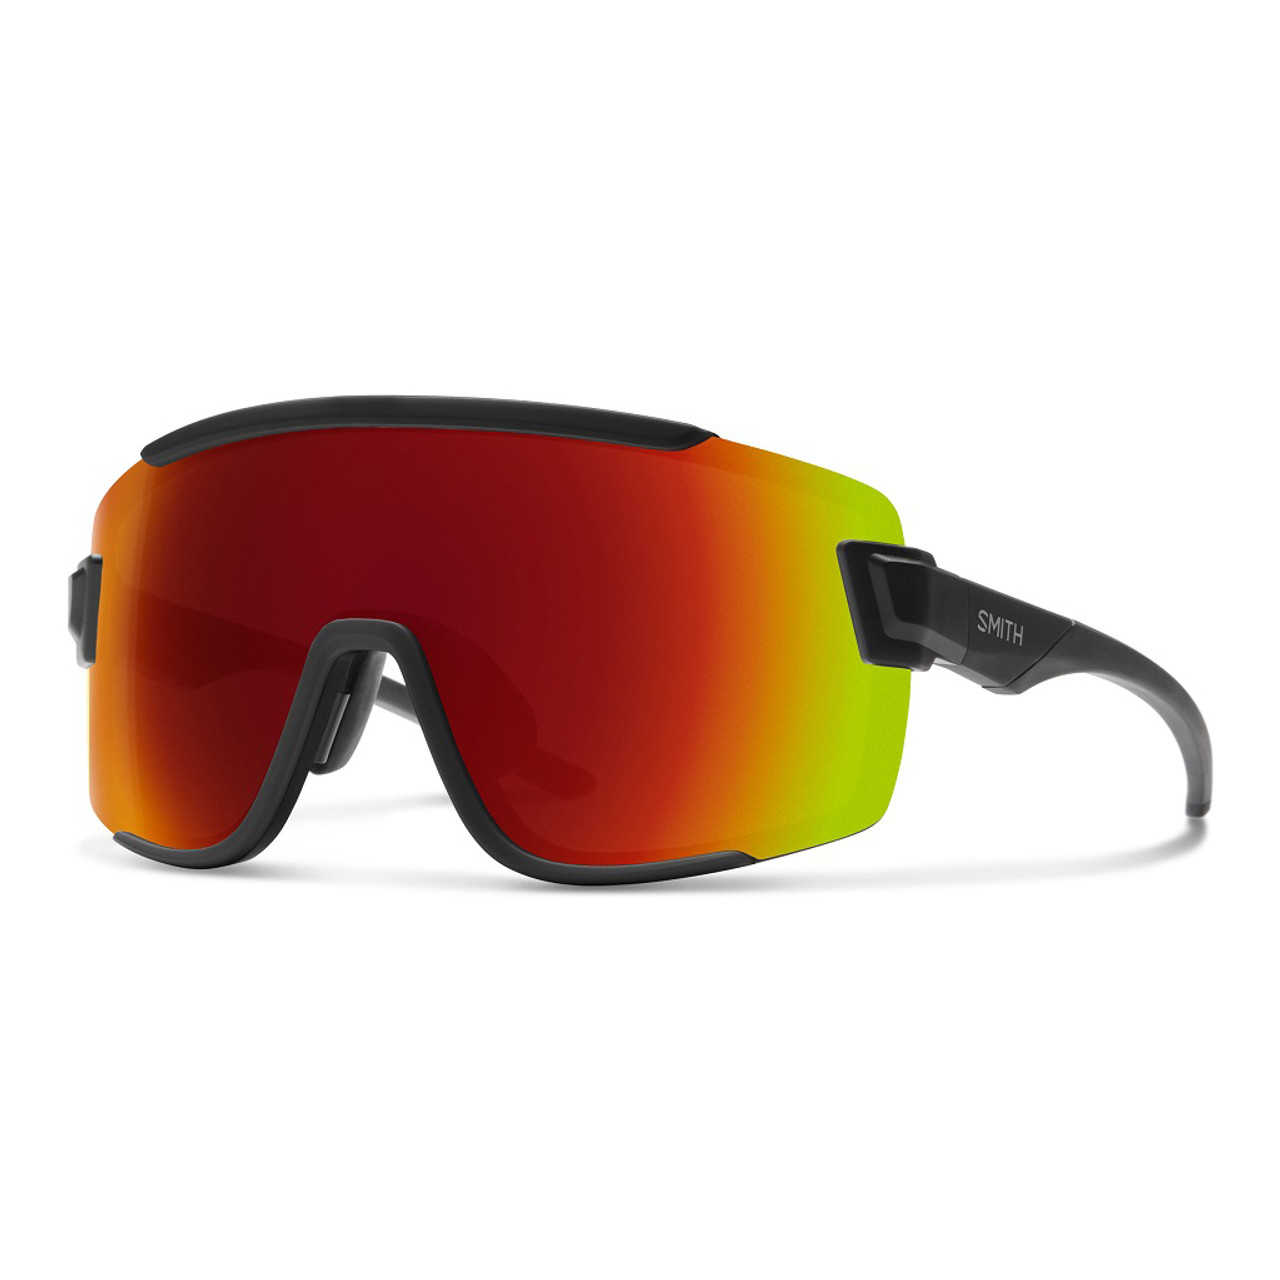 Matte Black w/ Chromapop Red Mirror - Smith Wildcat Sunglasses